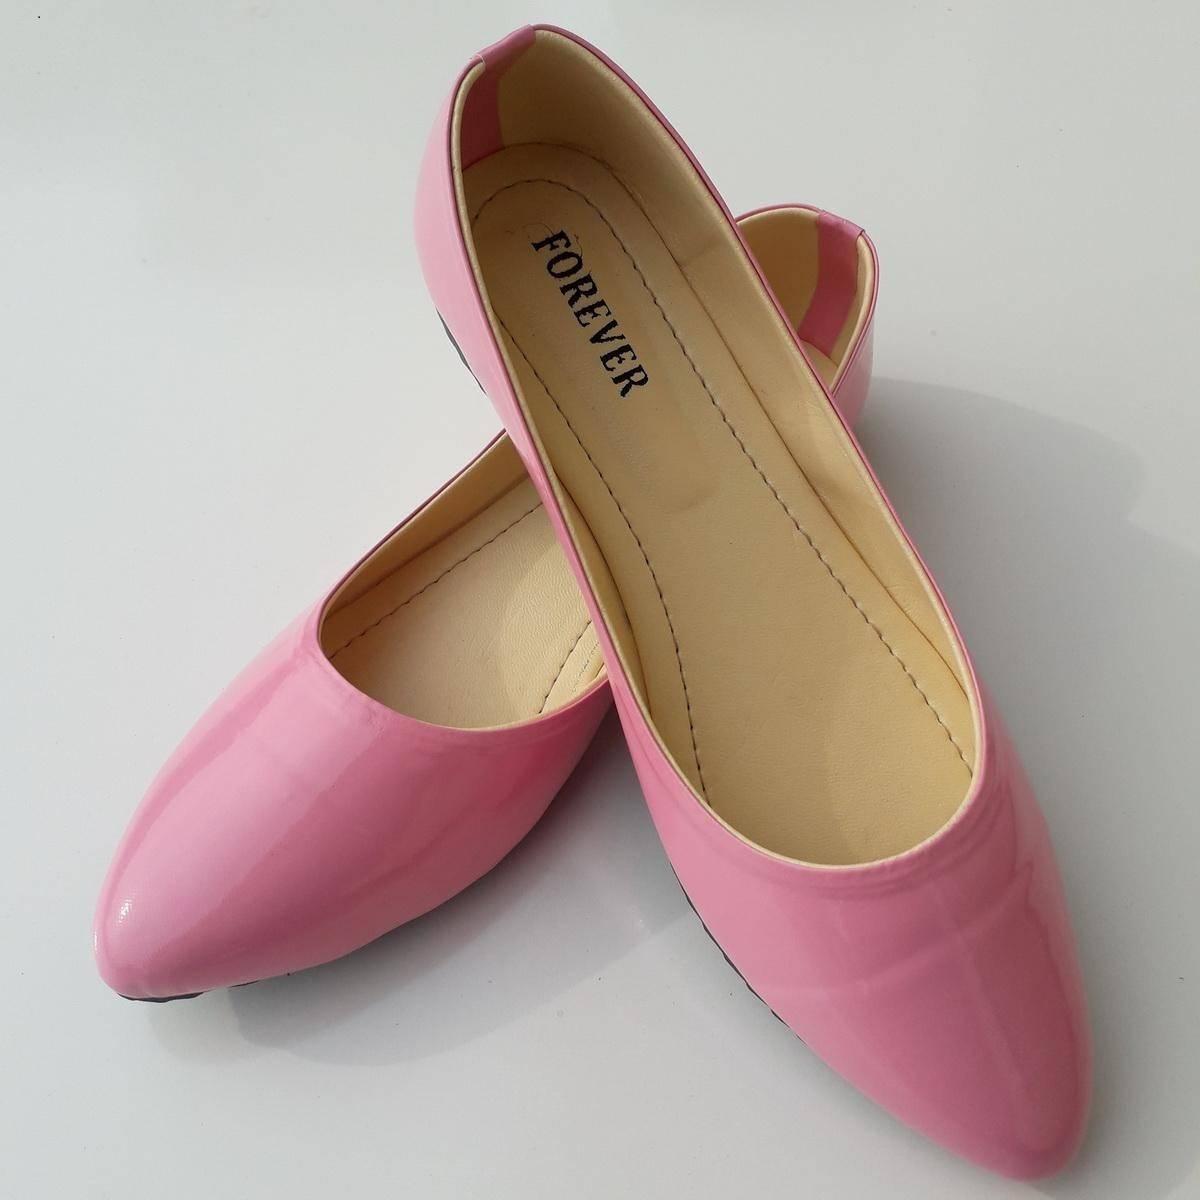 Shoes for Women Ladies Girls Stylish Design SH9